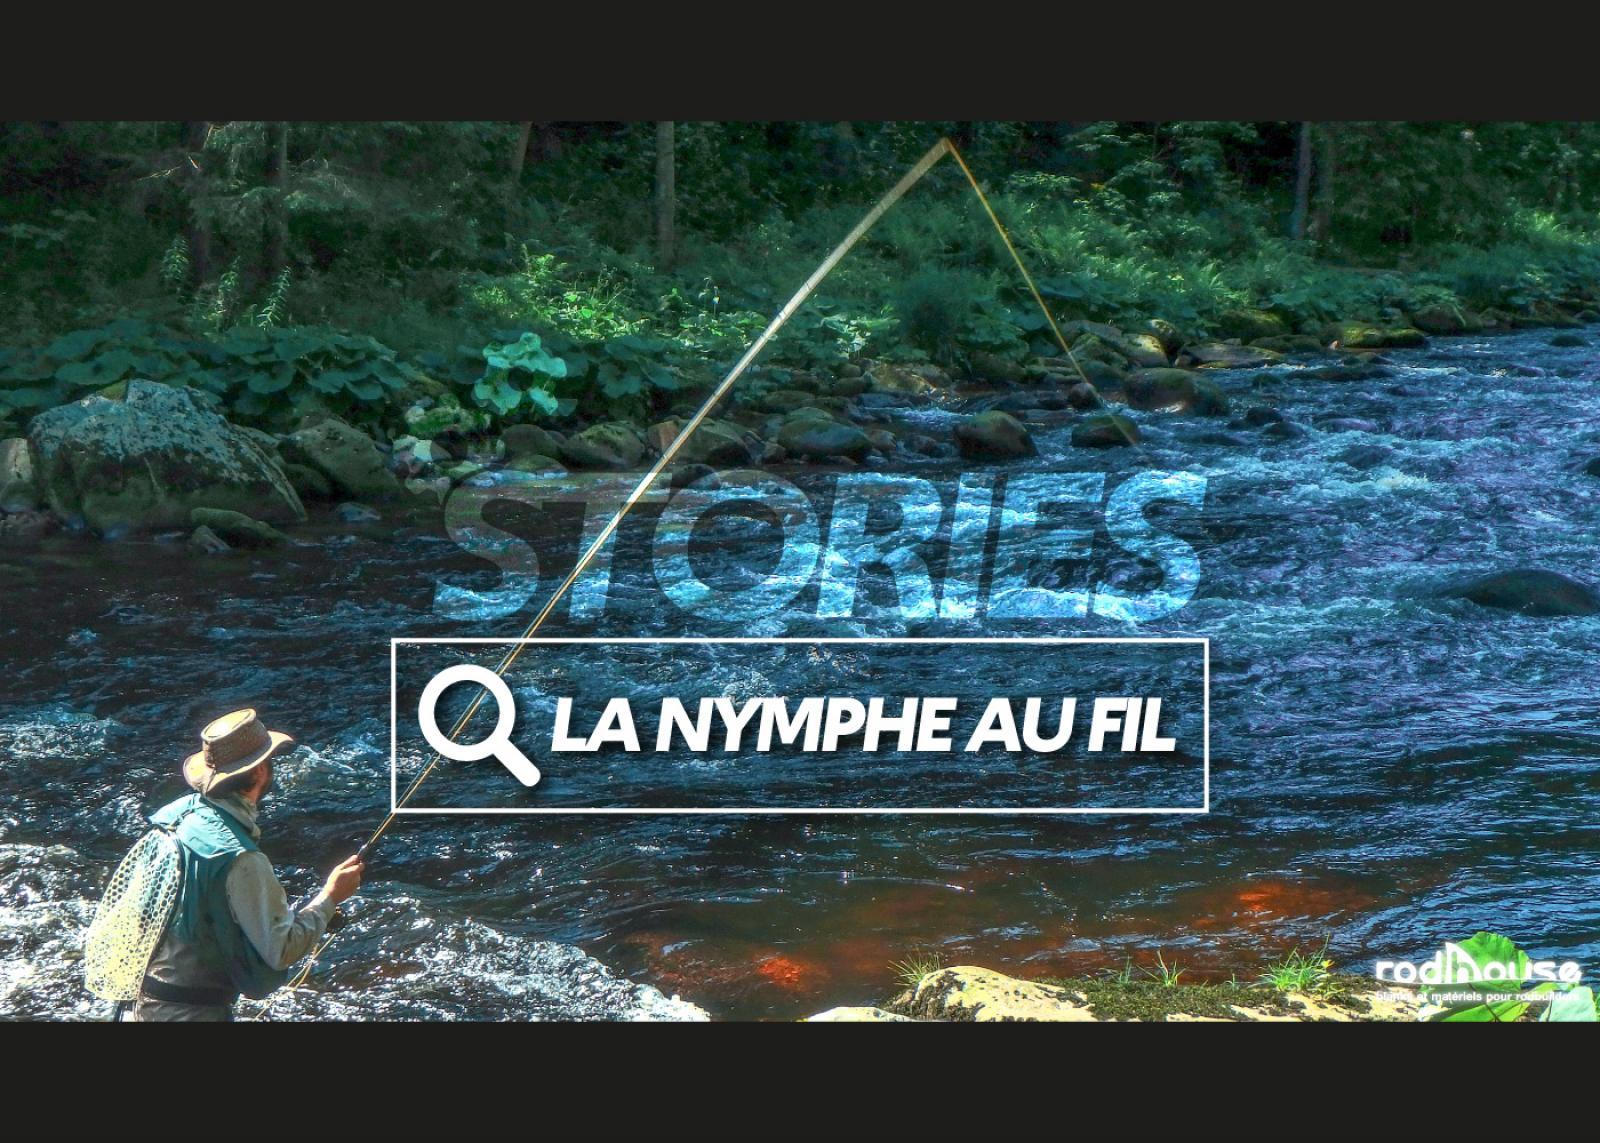 La pêche de la truite à la nymphe au fil